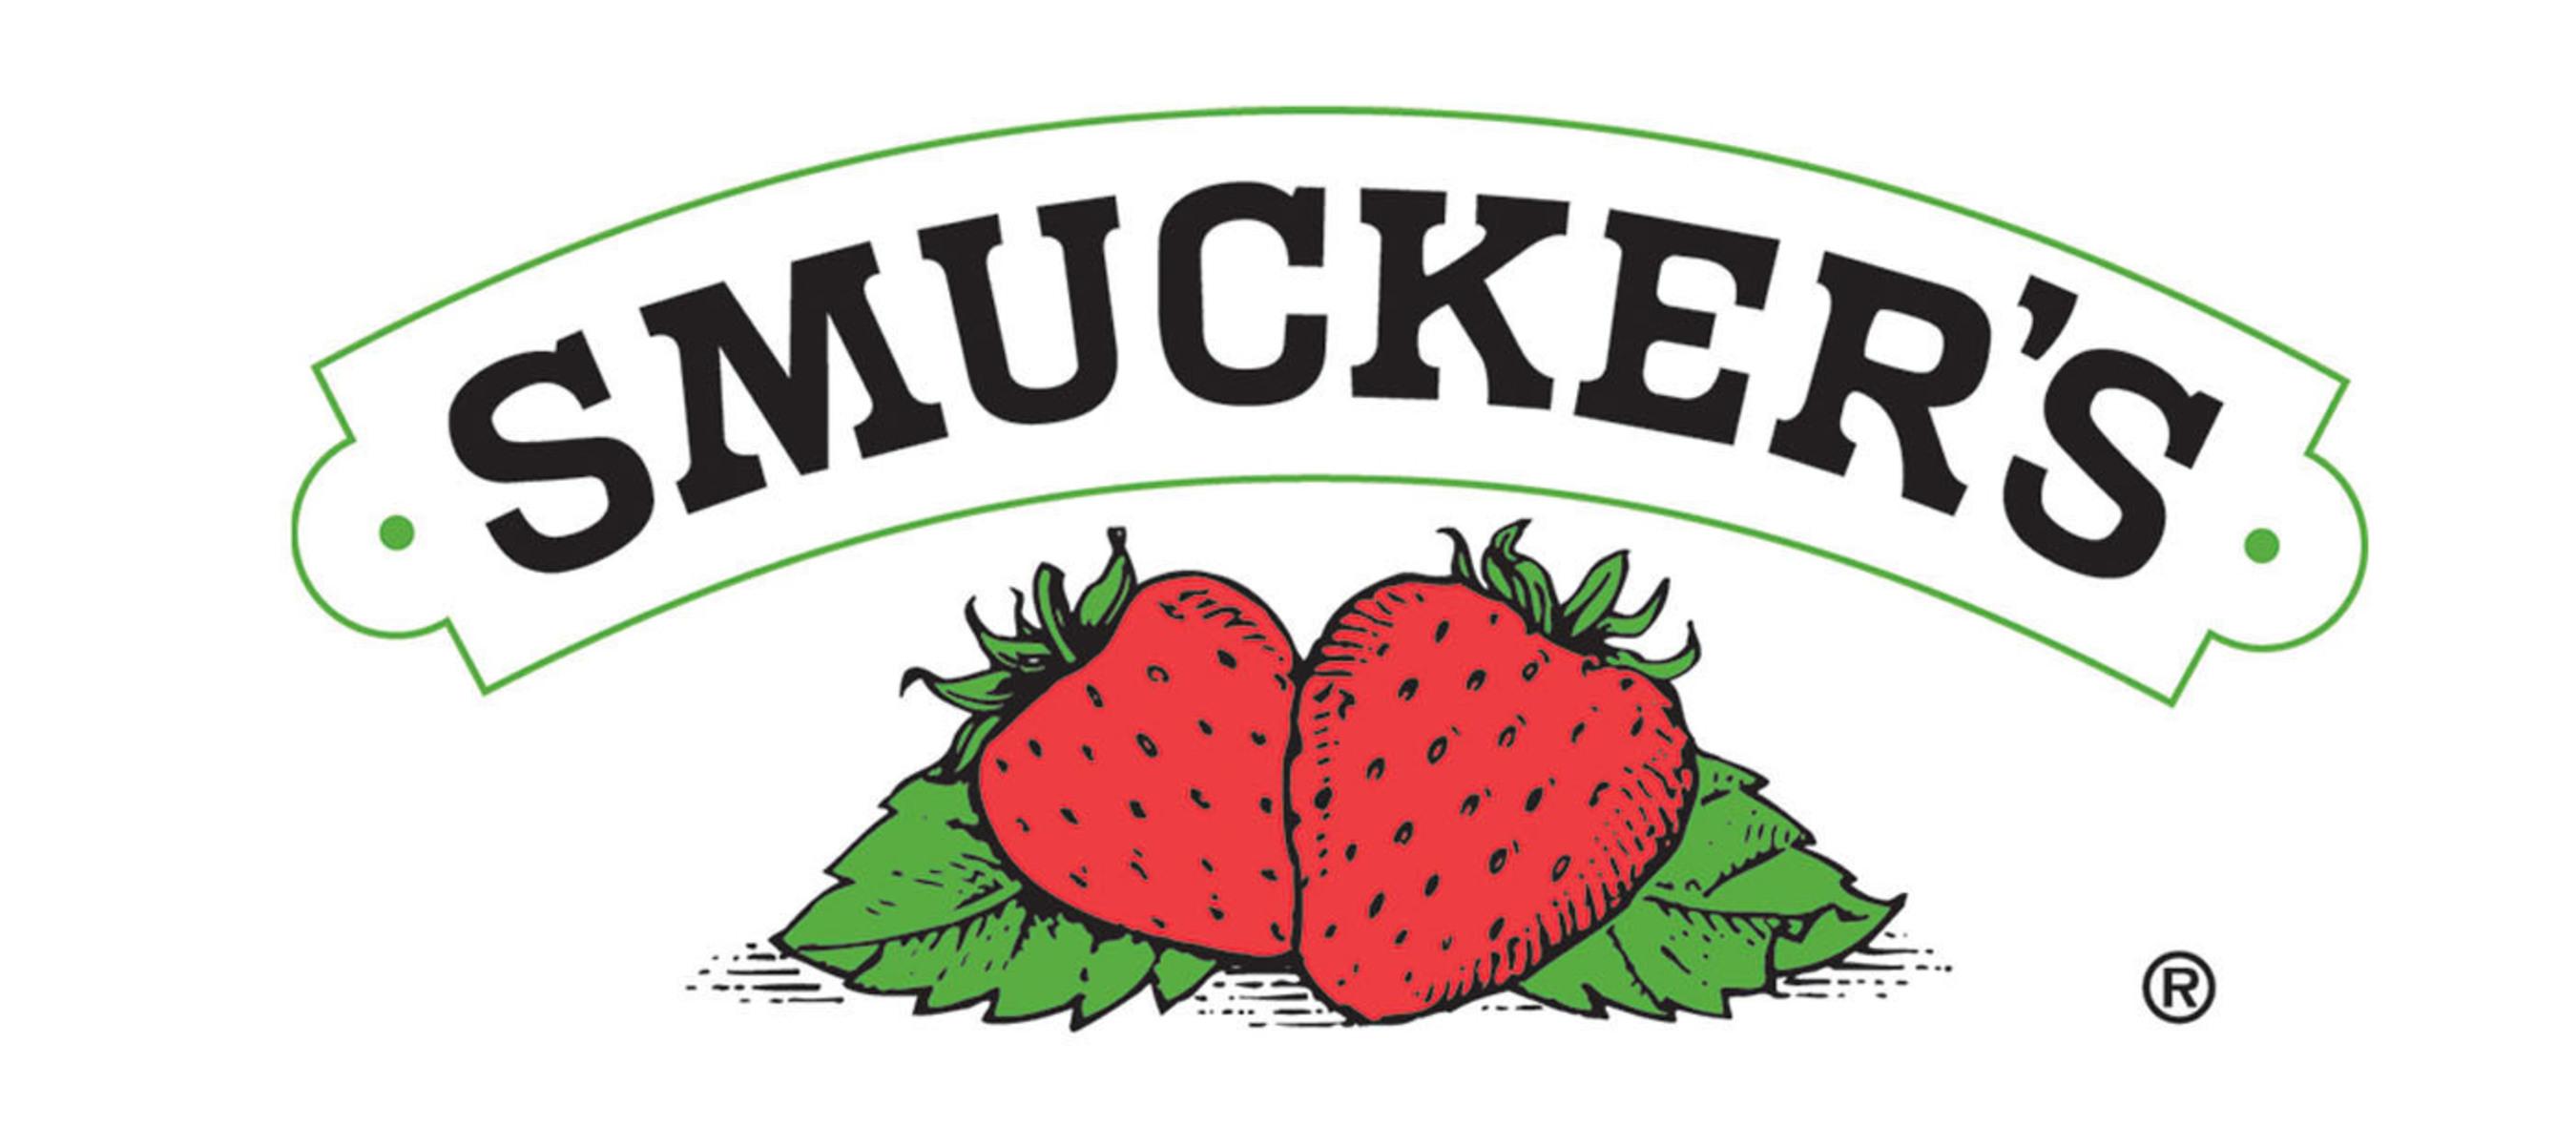 The J. M. Smucker Company logo.